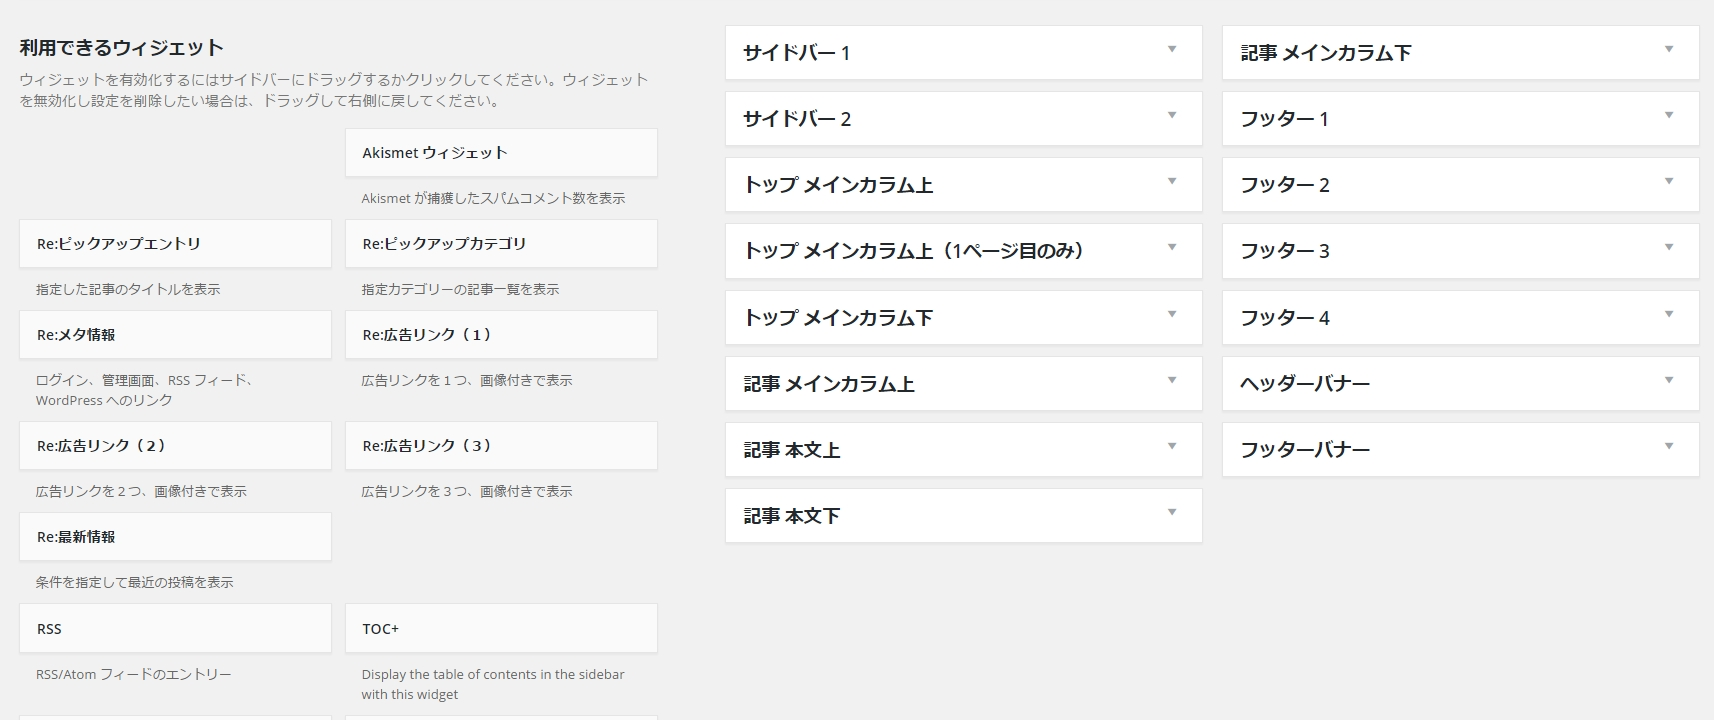 button-only@2x ワードプレスのサイドバーの編集方法(ウィジェットの使い方)